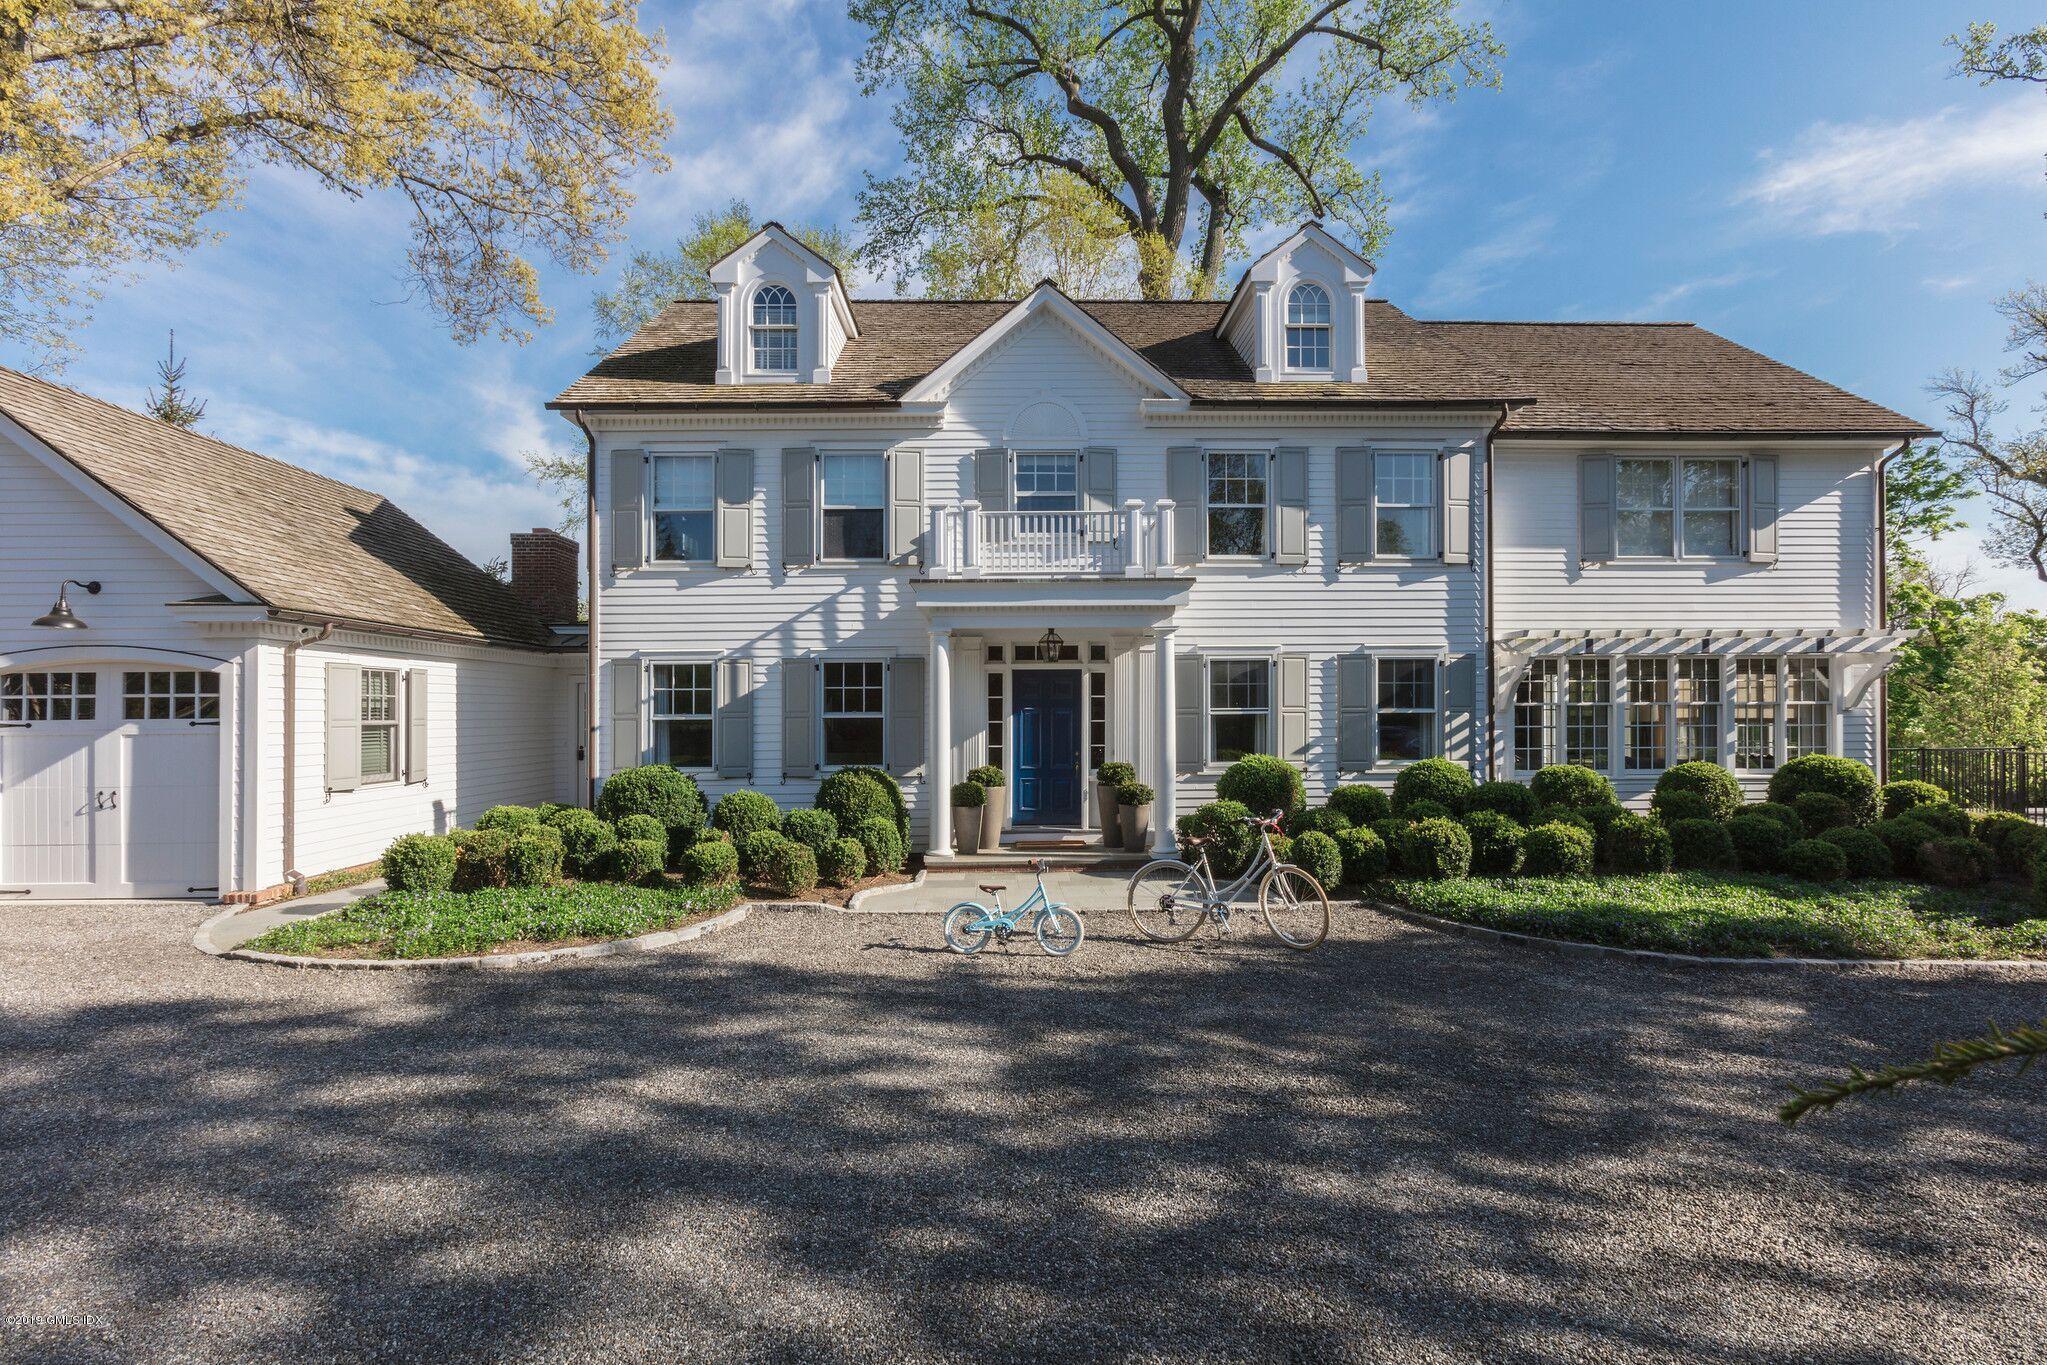 70 Otter Rock Drive,Greenwich,Connecticut 06830,5 Bedrooms Bedrooms,5 BathroomsBathrooms,Single family,Otter Rock,105714